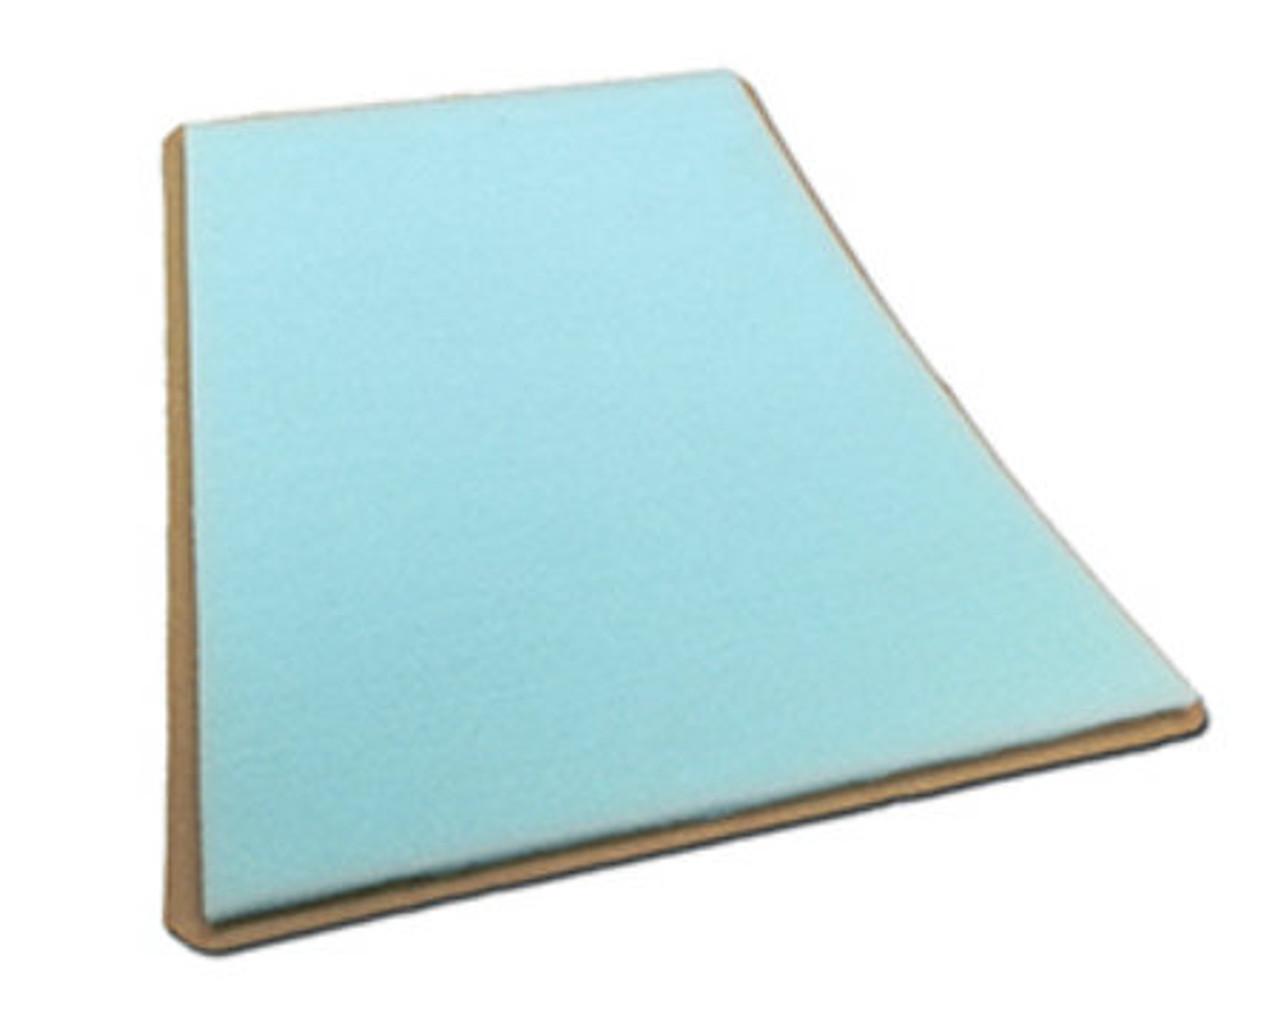 Cardboard Splints, Disposable - All Sizes